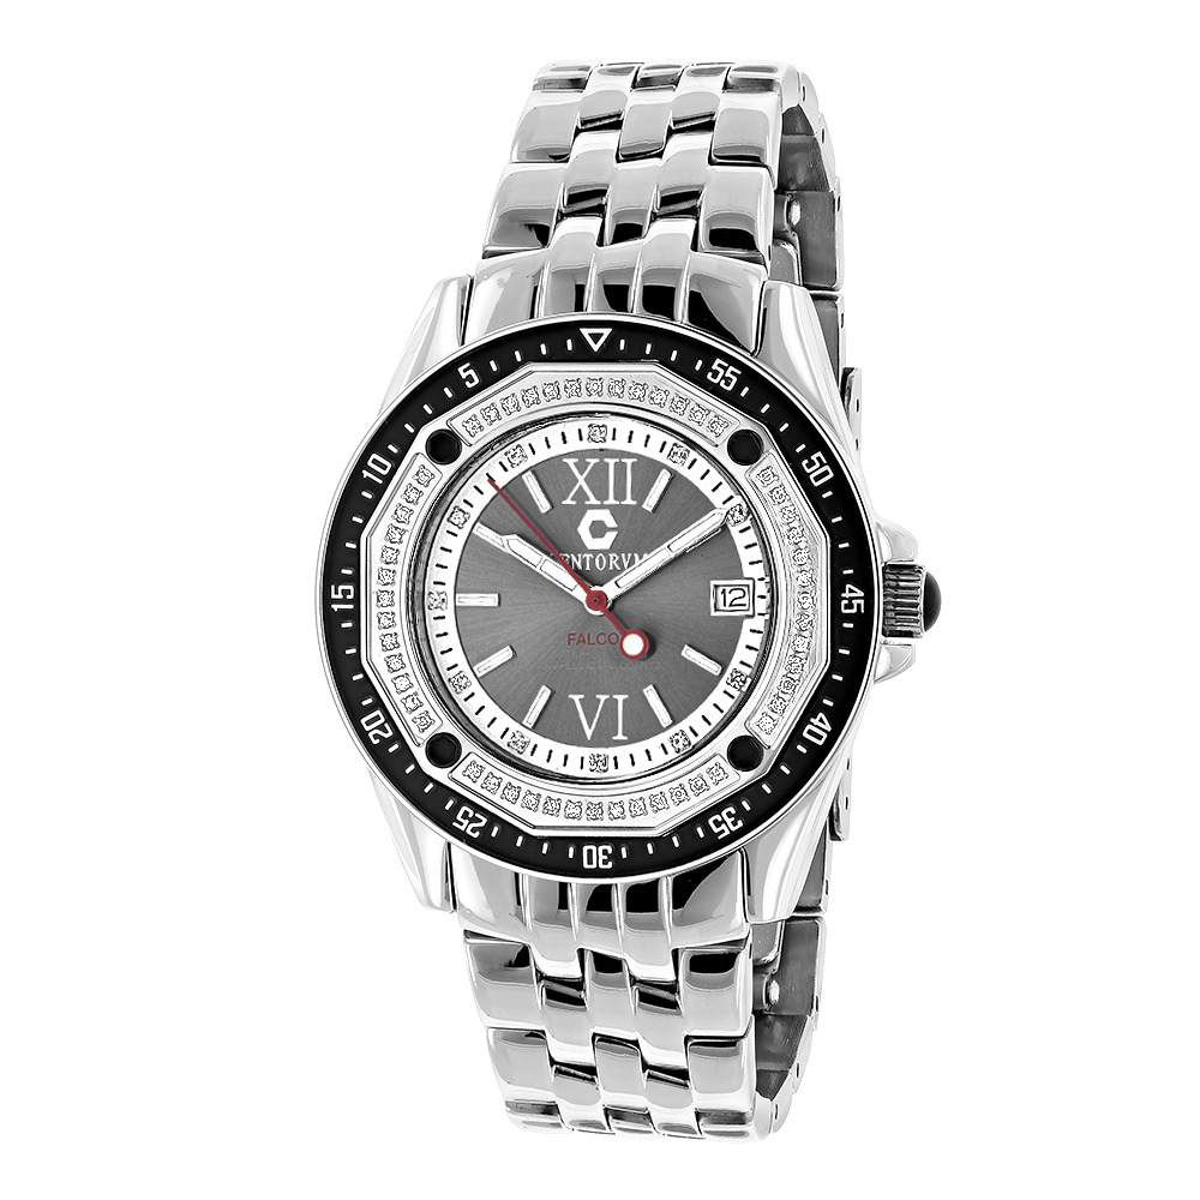 Designer Watches: Centorum Diamond Watch 0.50ct Midsize Falcon